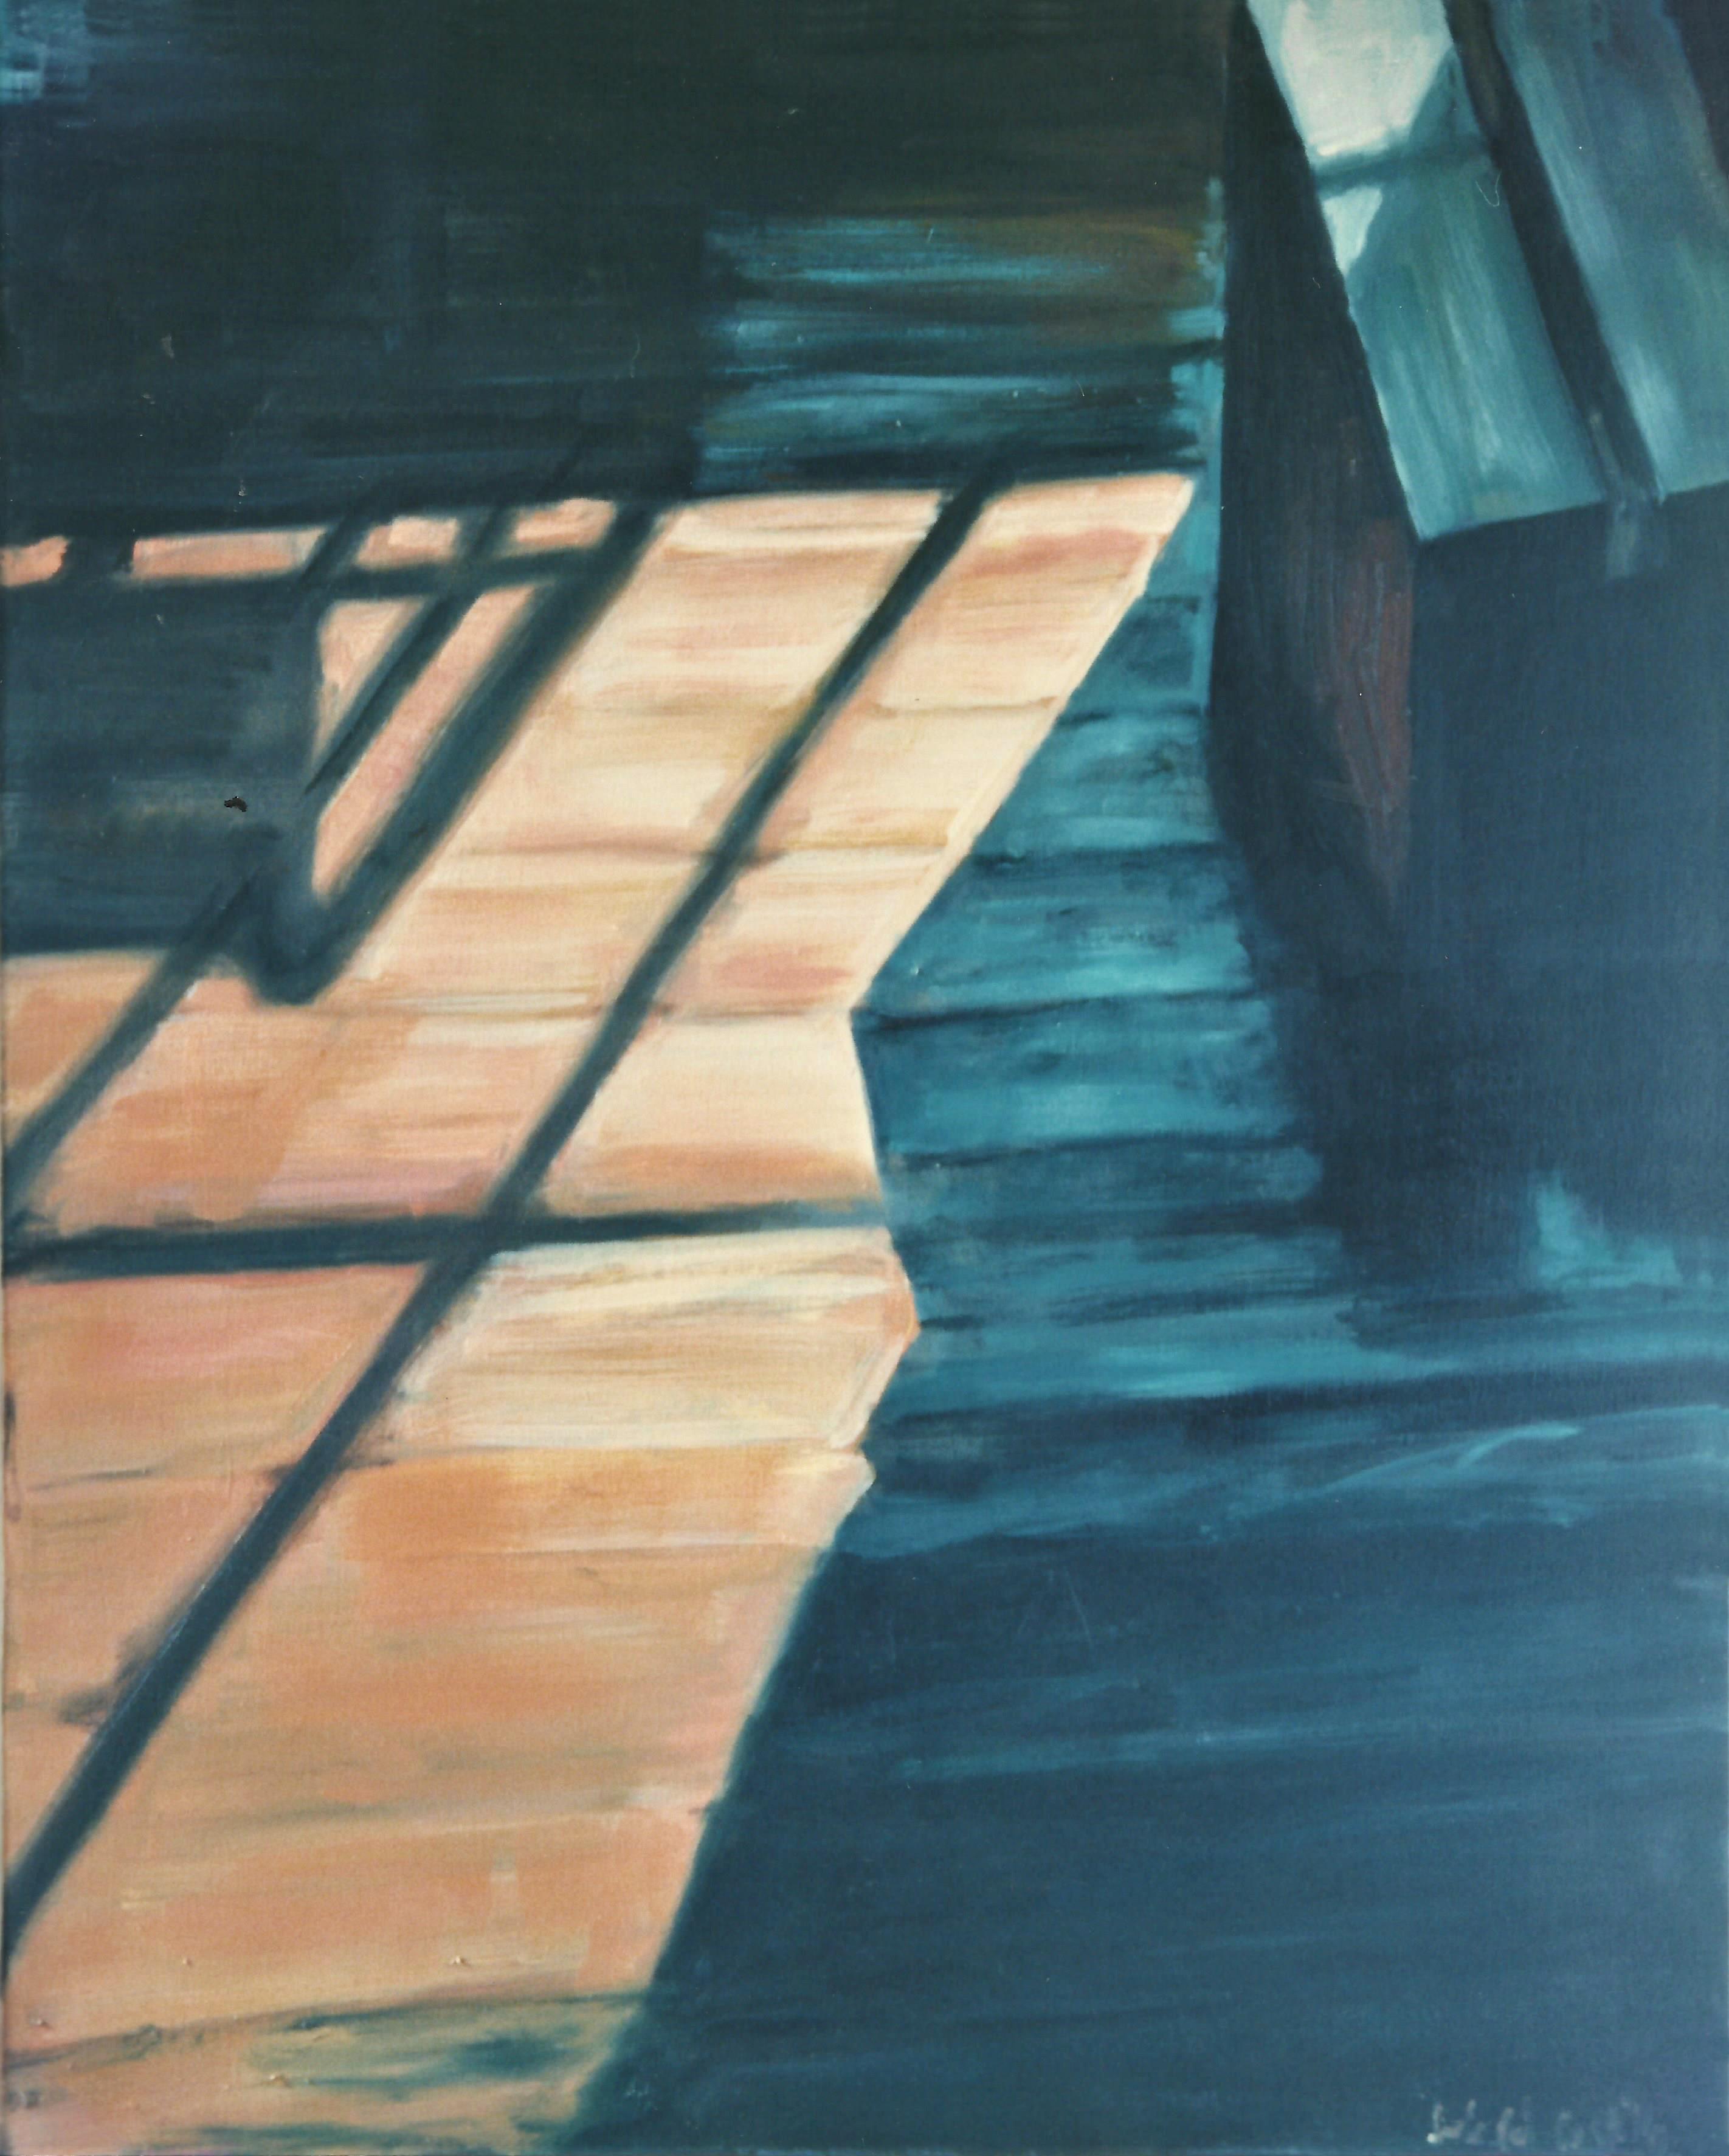 sin título · óleo sobre lienzo · 80 x 65 cm